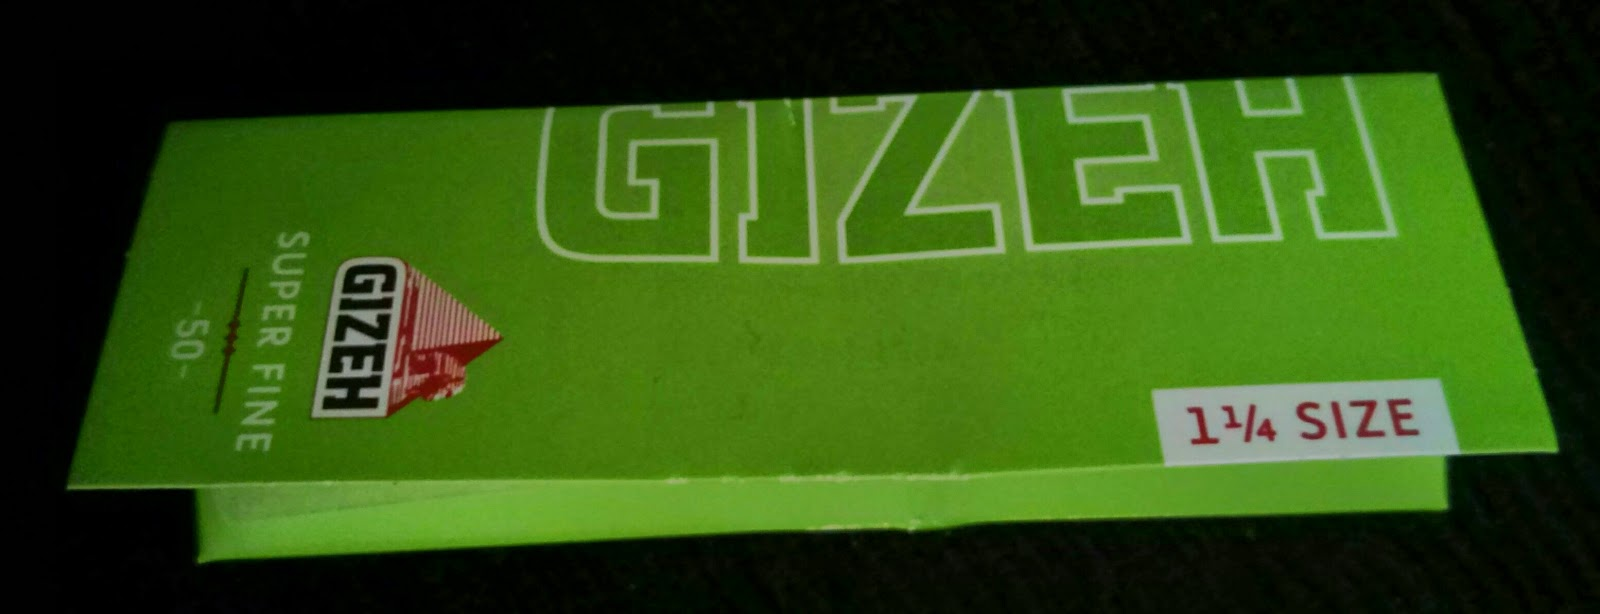 papel Gizeh liar fumar